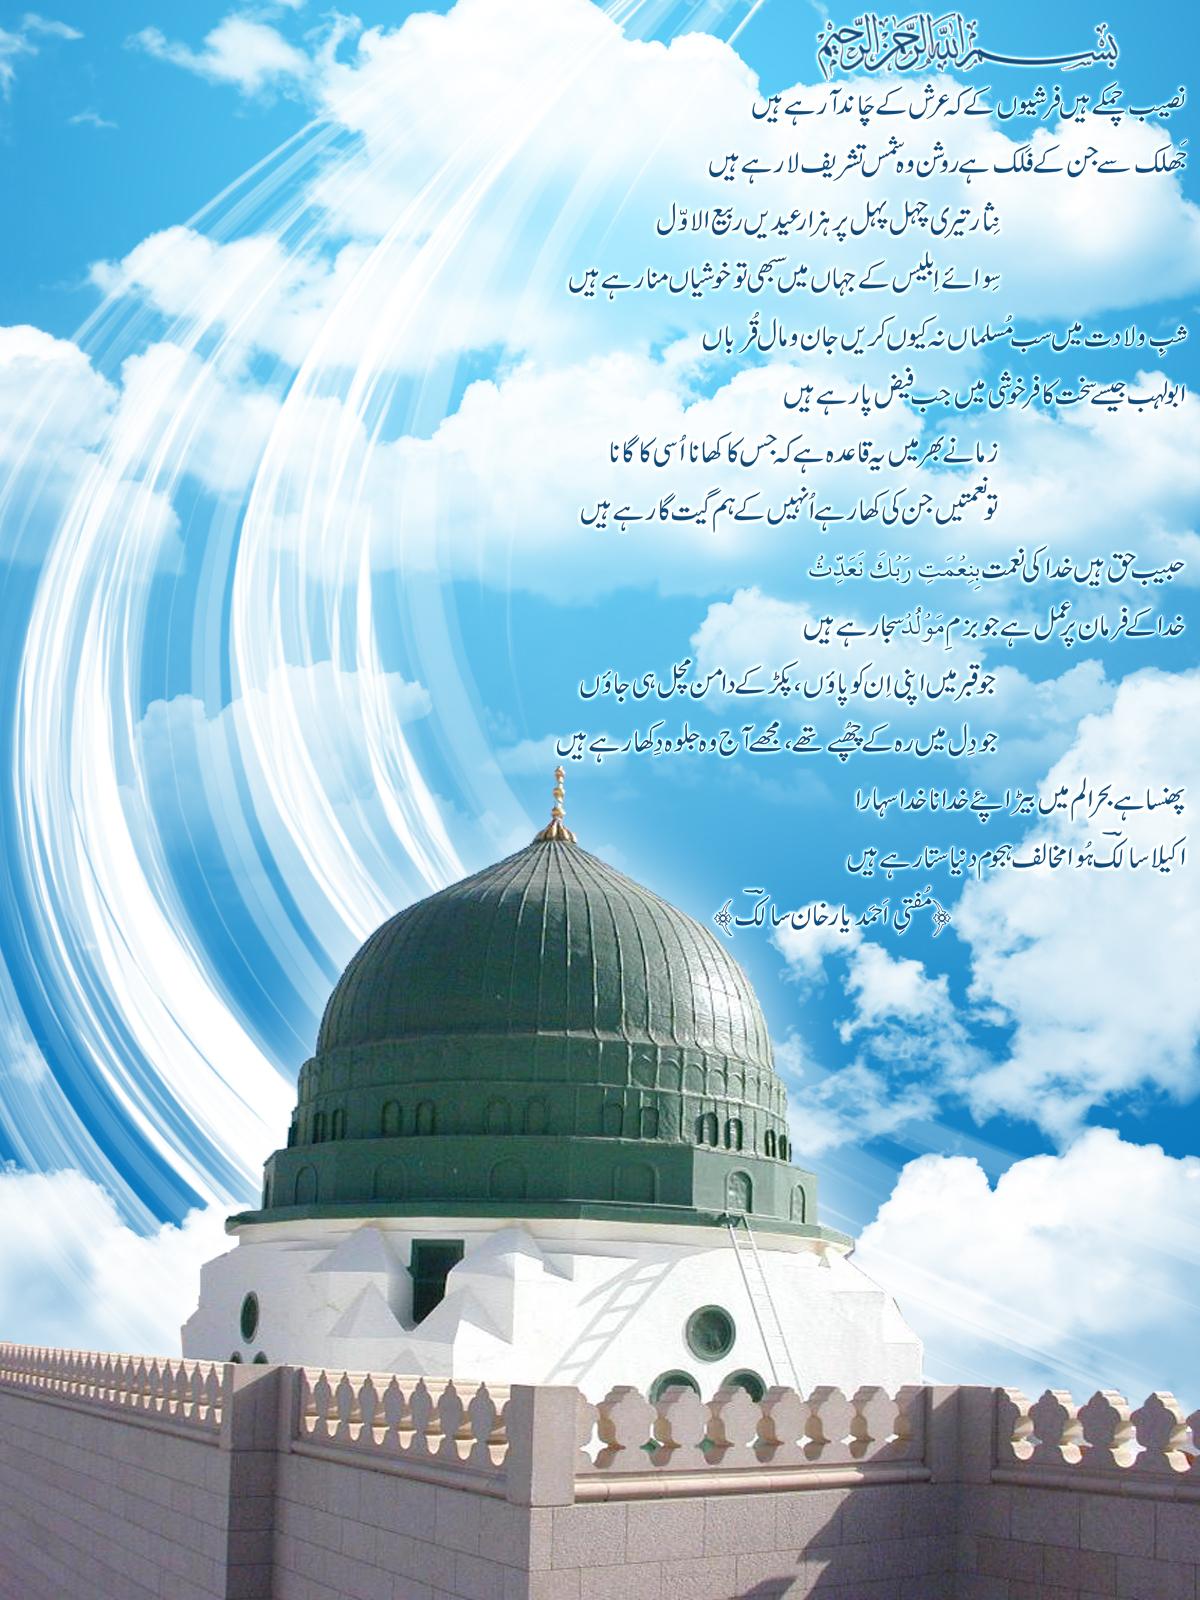 nath sharif download